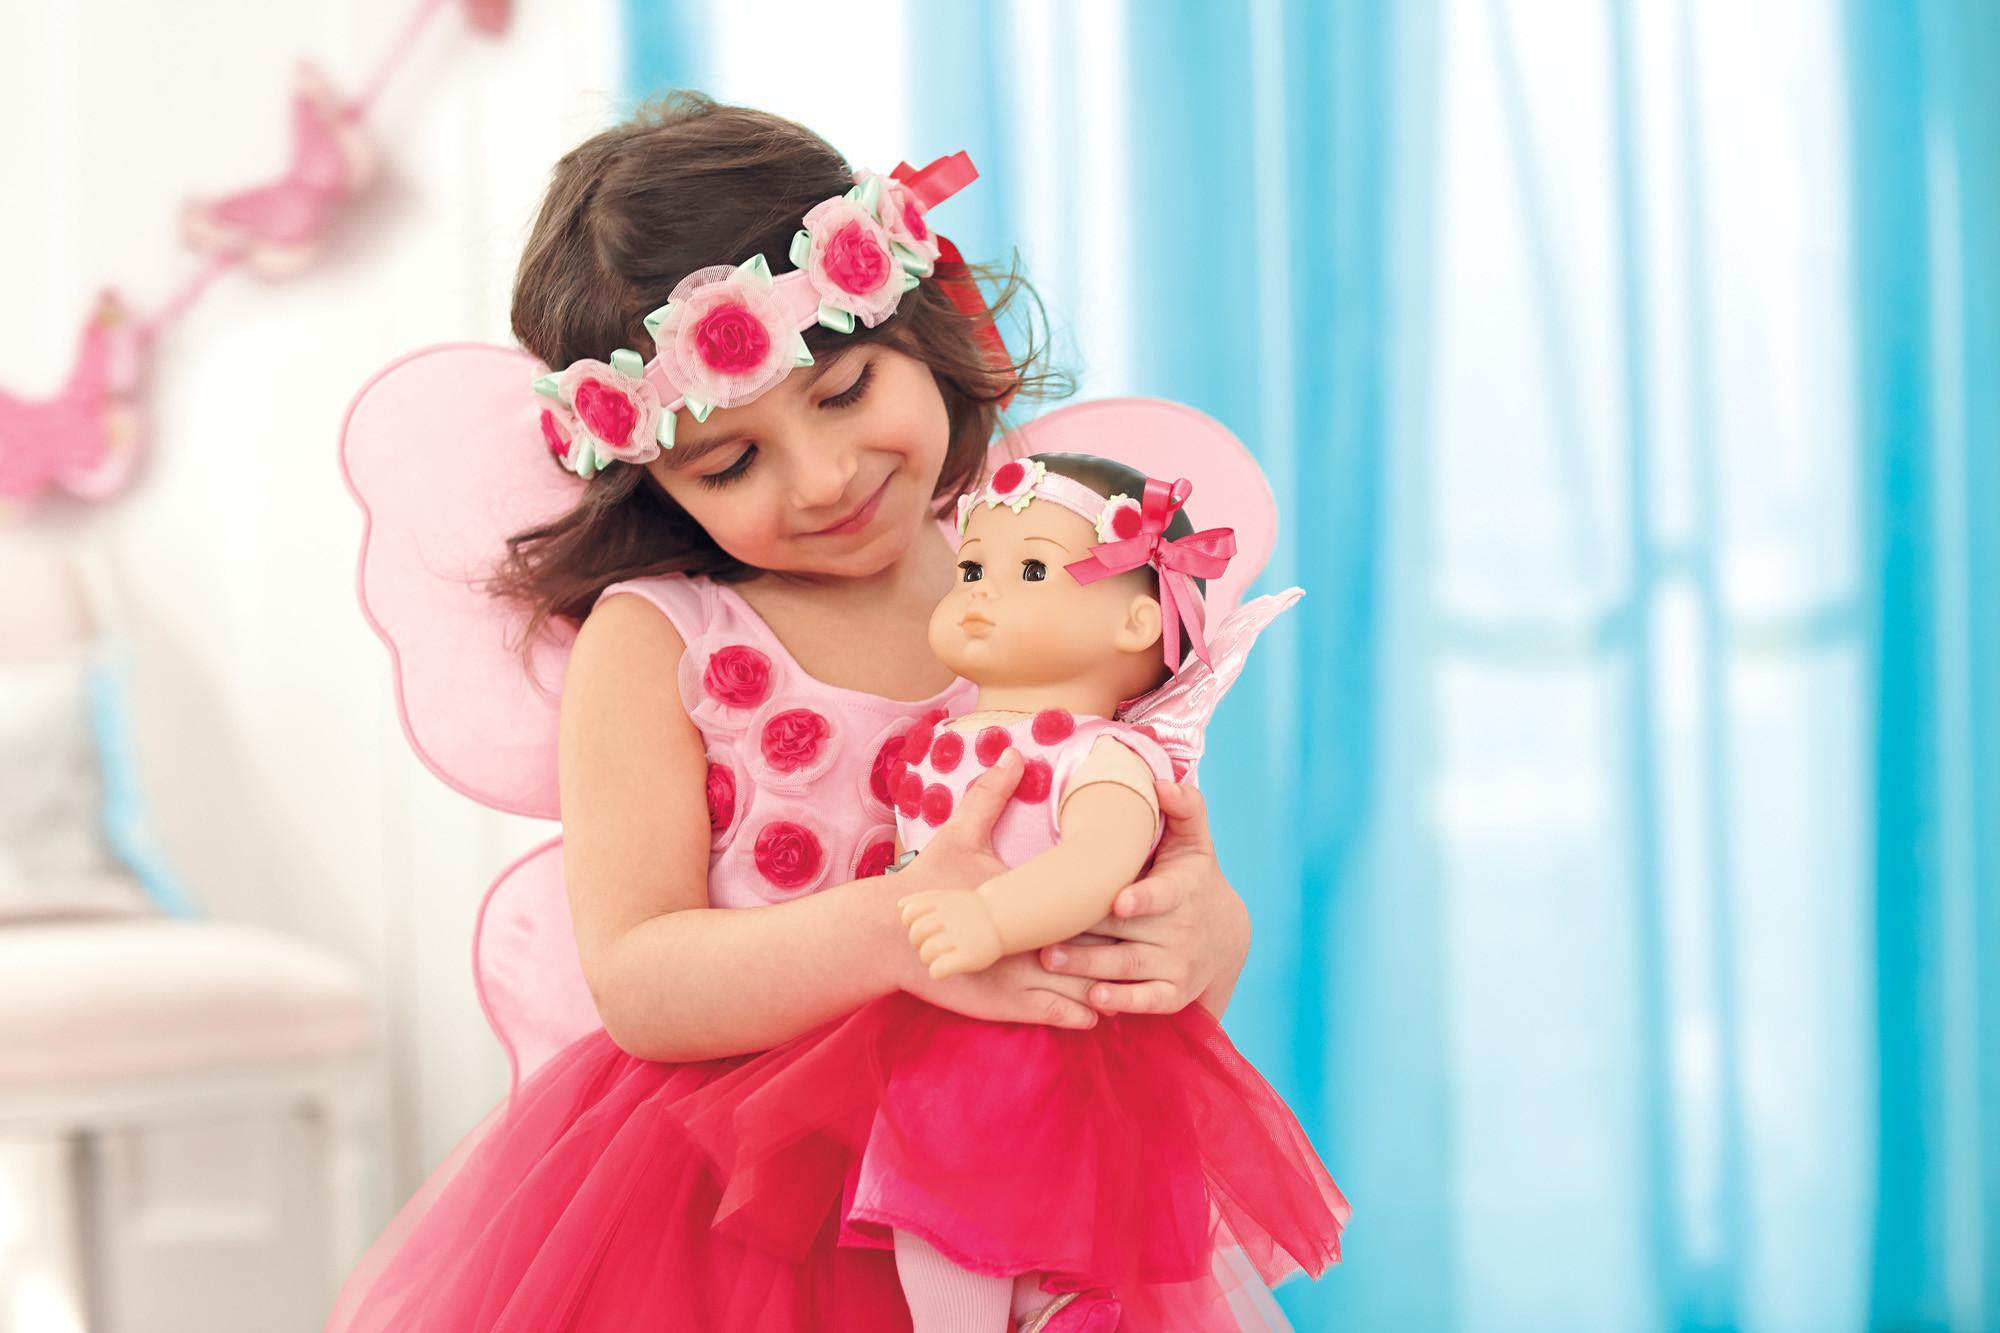 american girl doll wallpaper